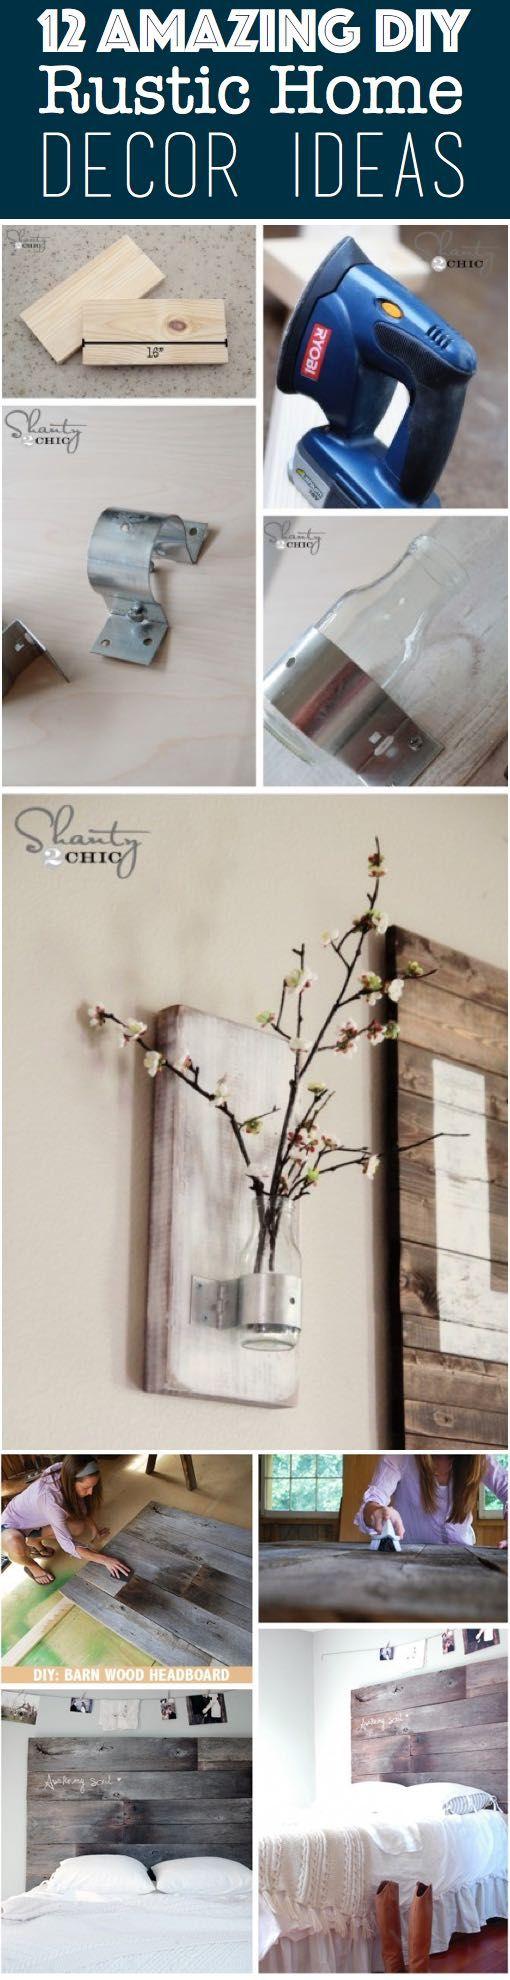 12+Amazing+DIY+Rustic+Home+Decor+Ideas DIY Home Decor